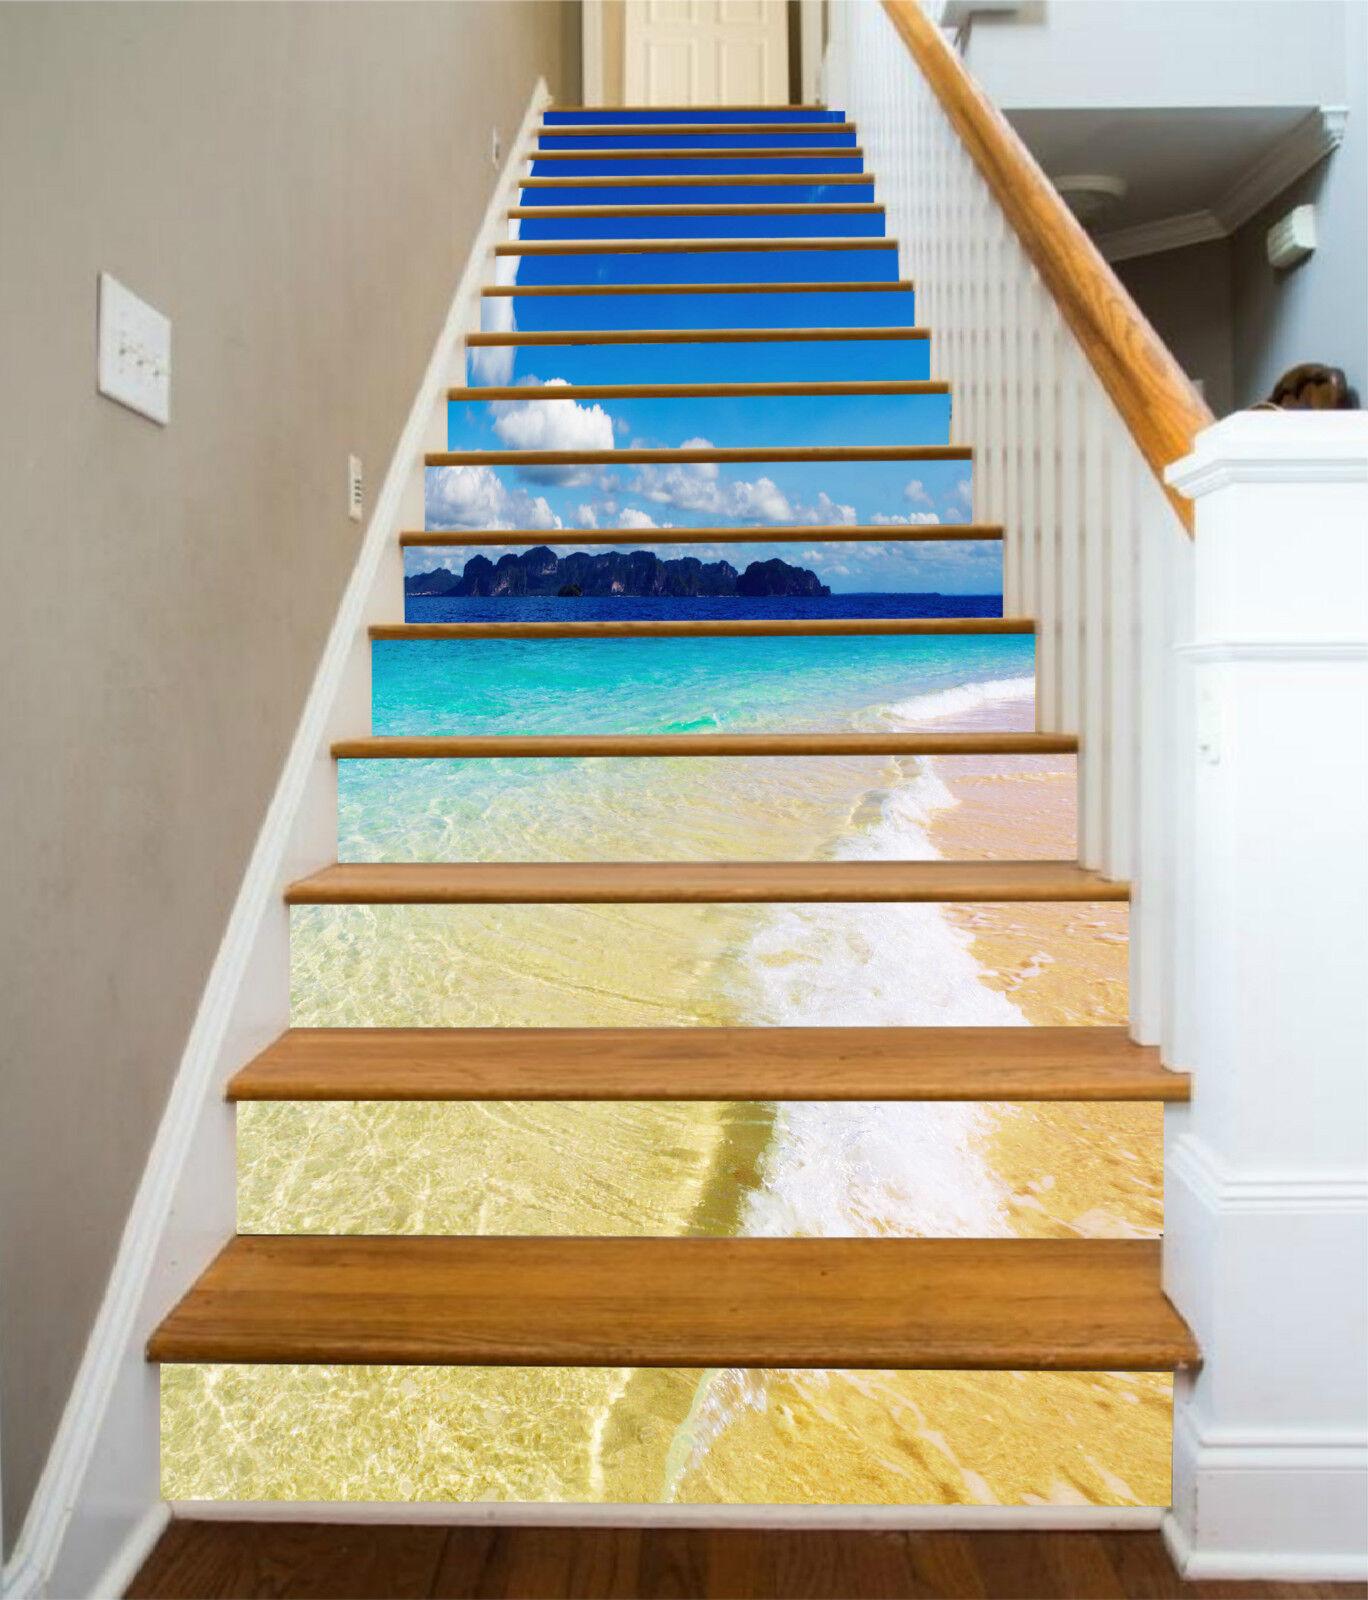 3D Schöne Meer 0012 Stair Risers Dekoration Fototapete Vinyl Aufkleber Tapete DE